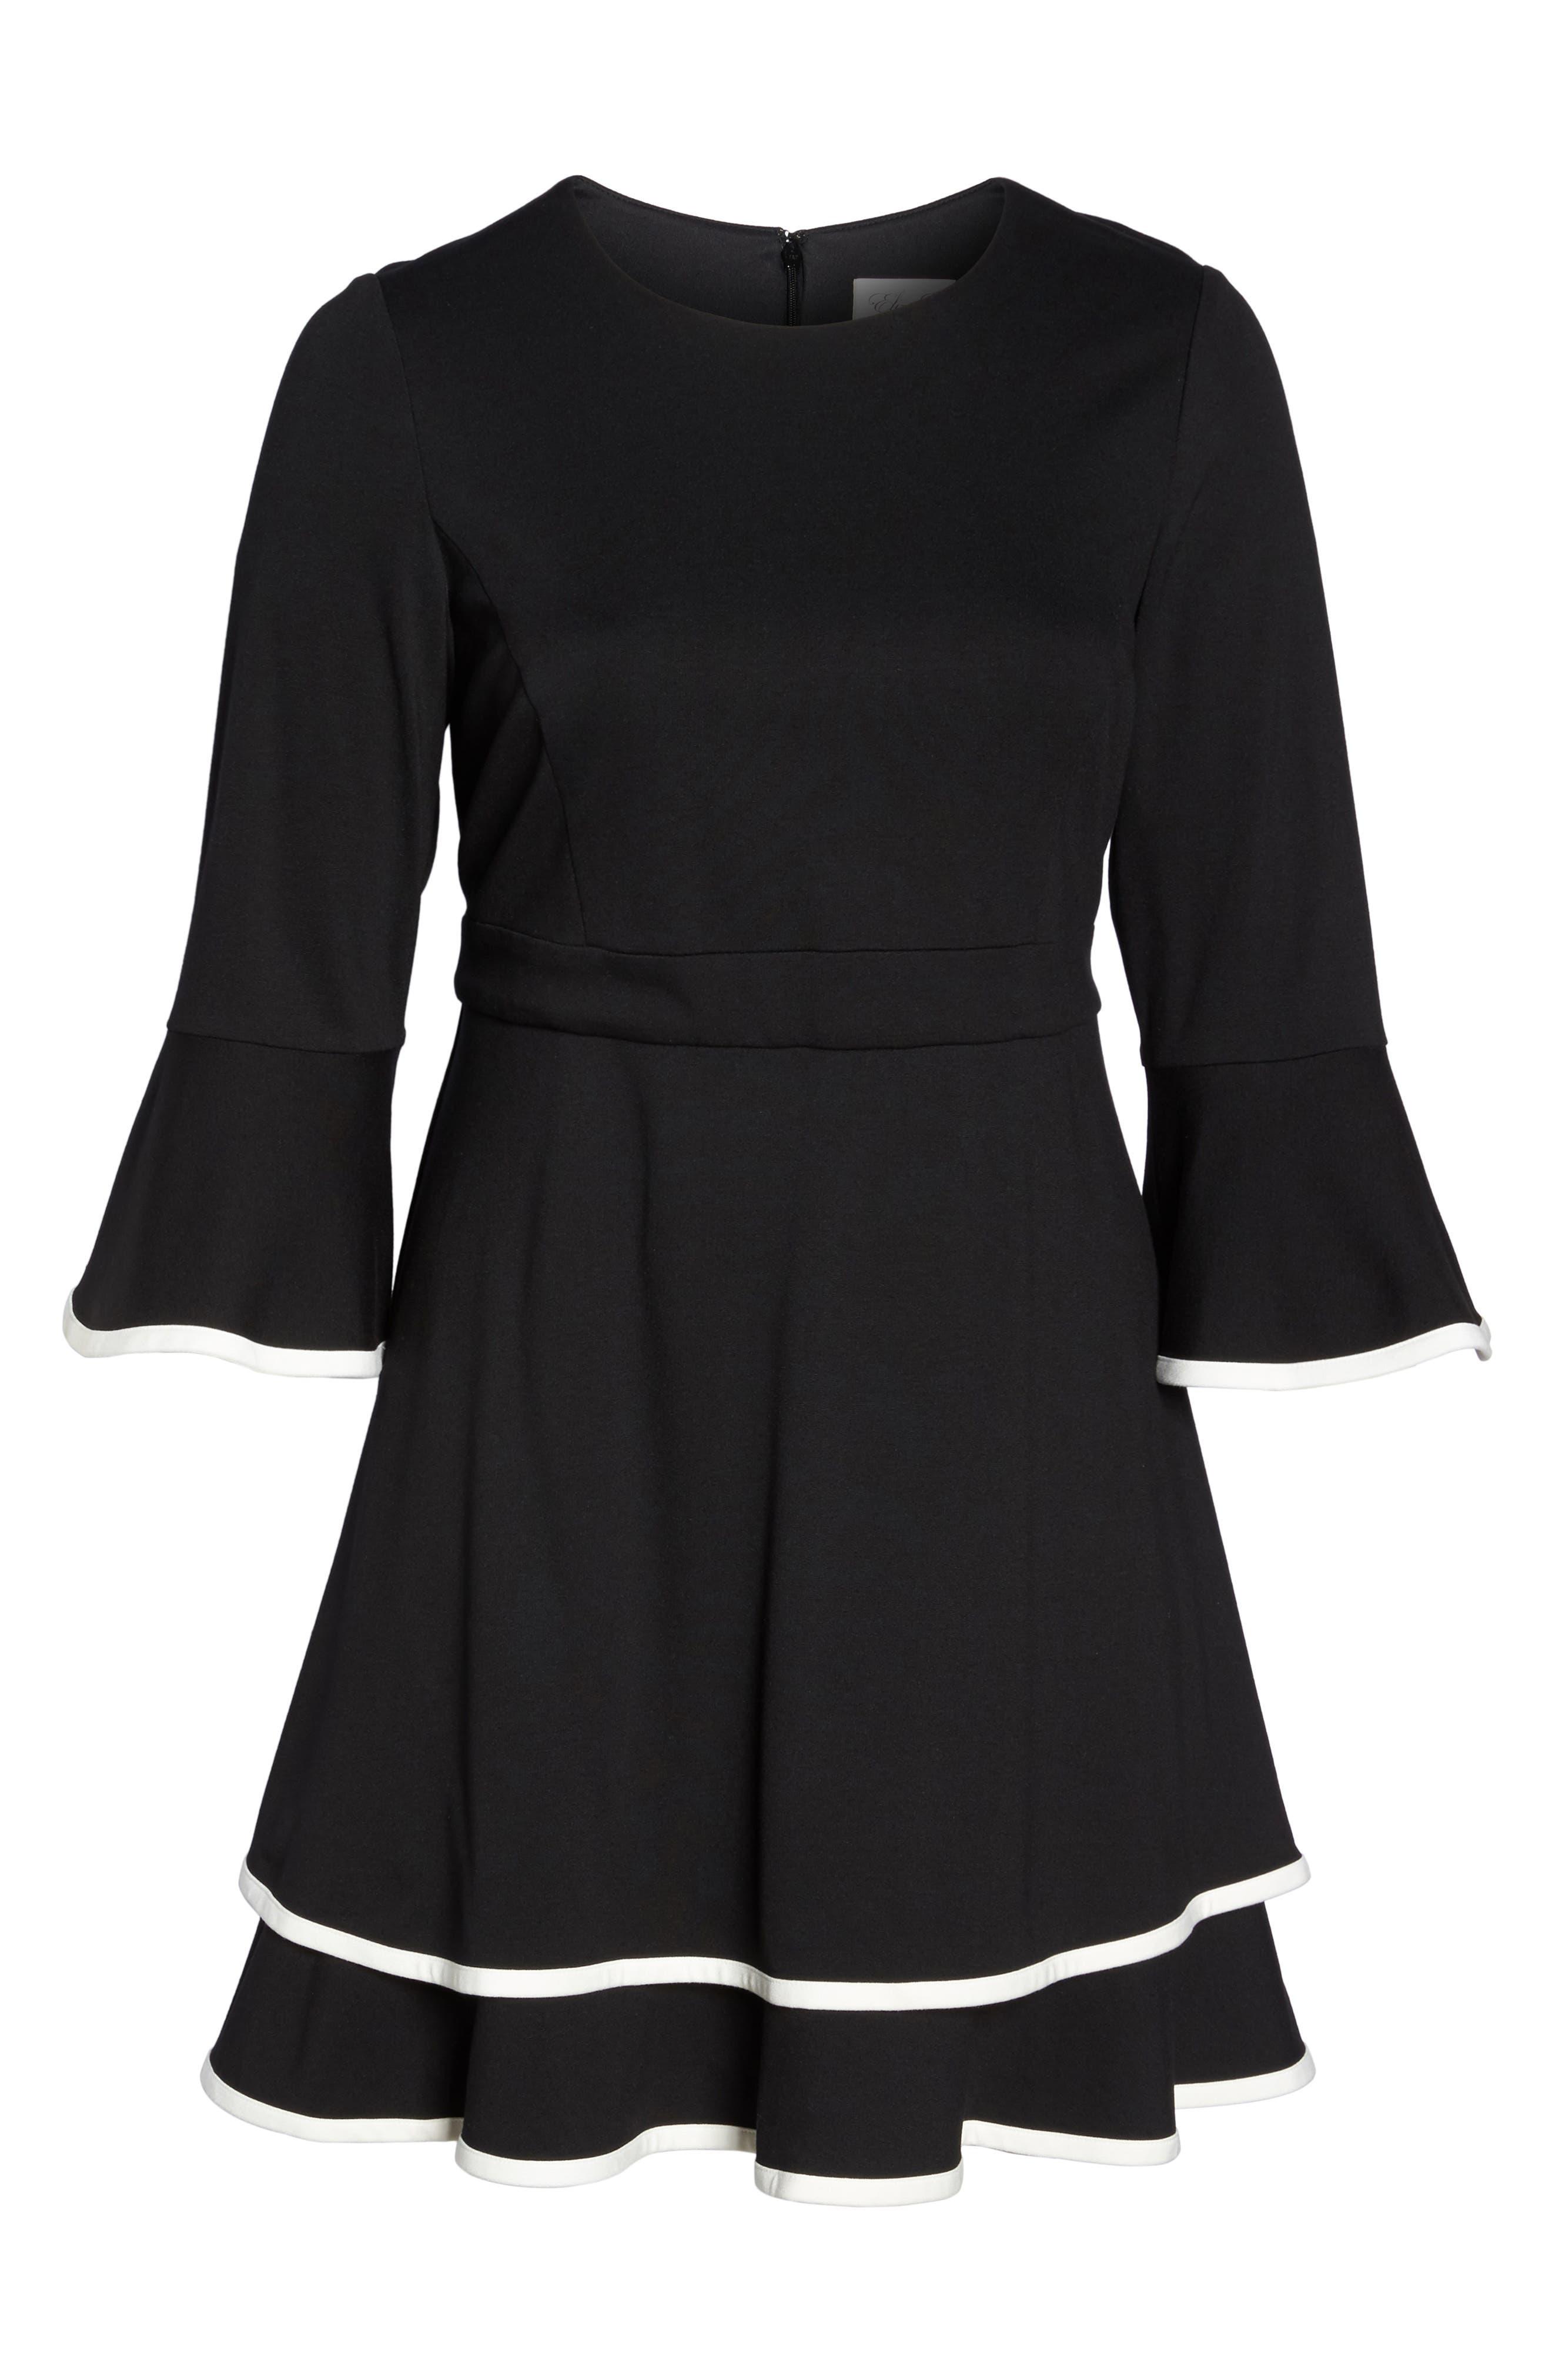 Bell Sleeve Contrast Trim Fit & Flare Dress,                             Alternate thumbnail 6, color,                             BLACK/ IVORY